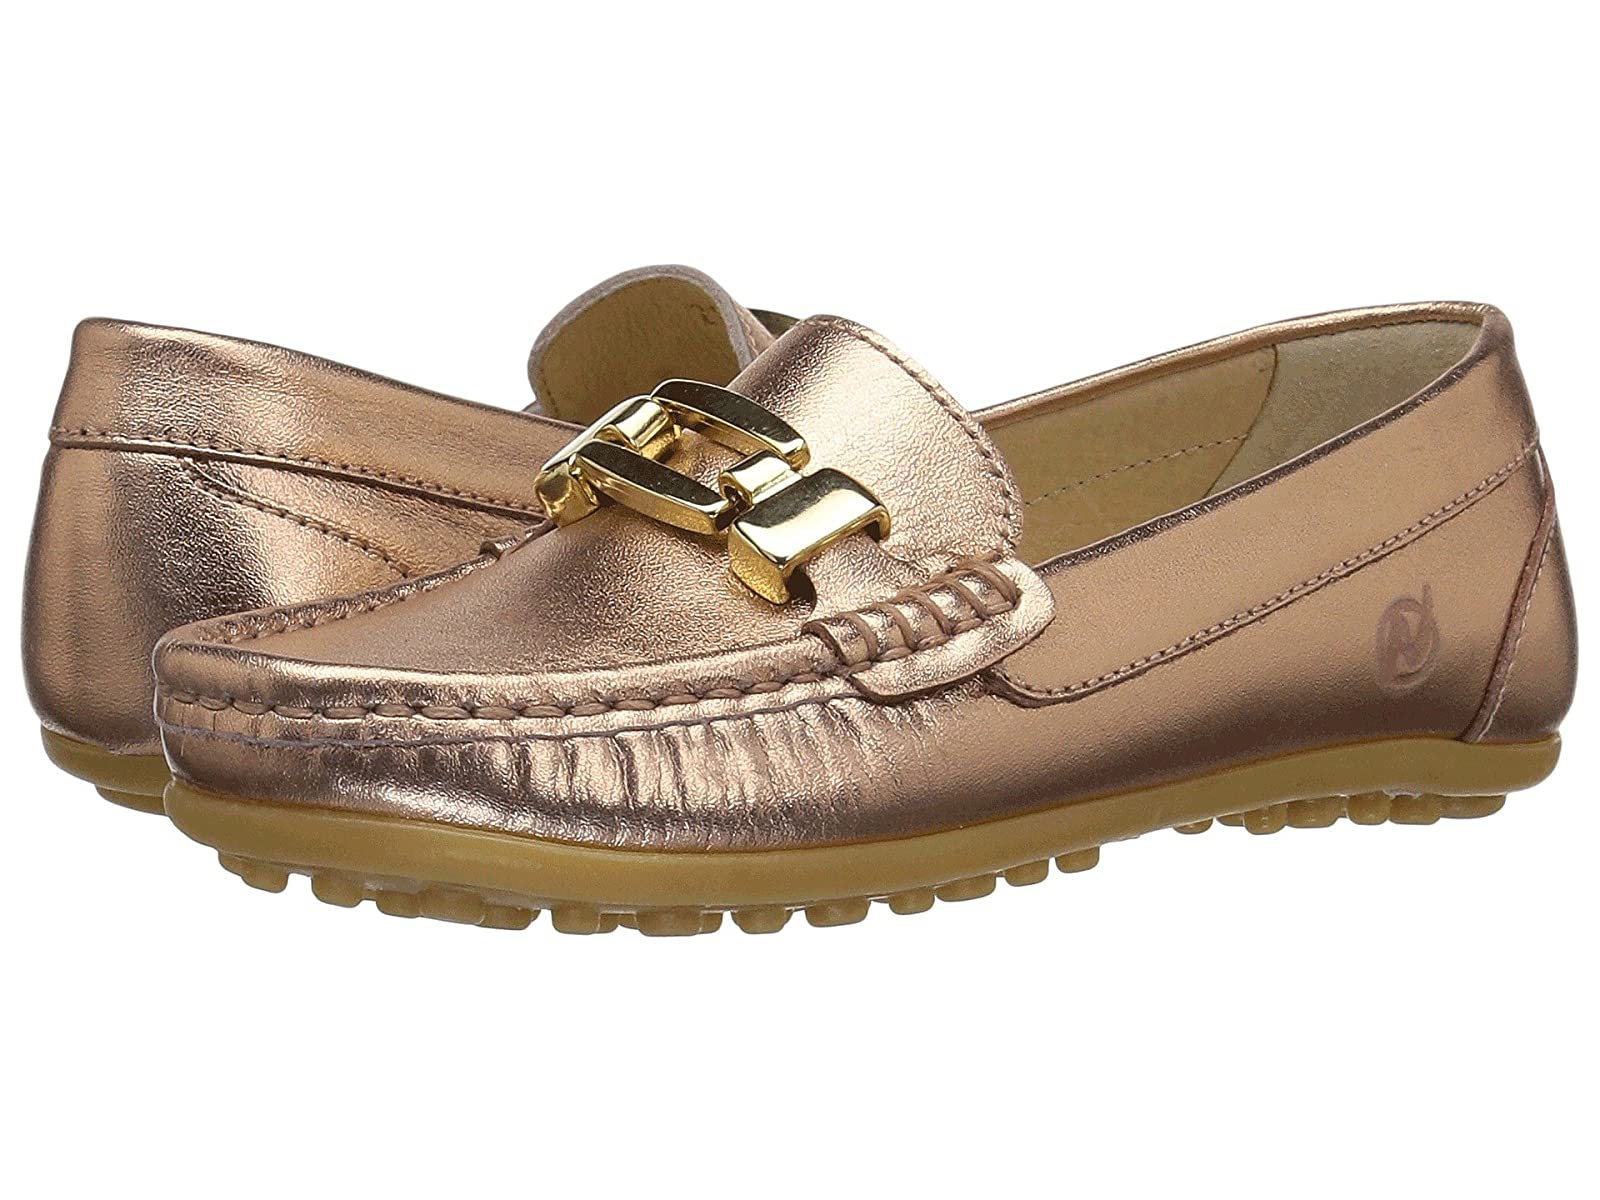 Naturino 4140 USA SS17 (Little Kid/Big Kid)Cheap and distinctive eye-catching shoes